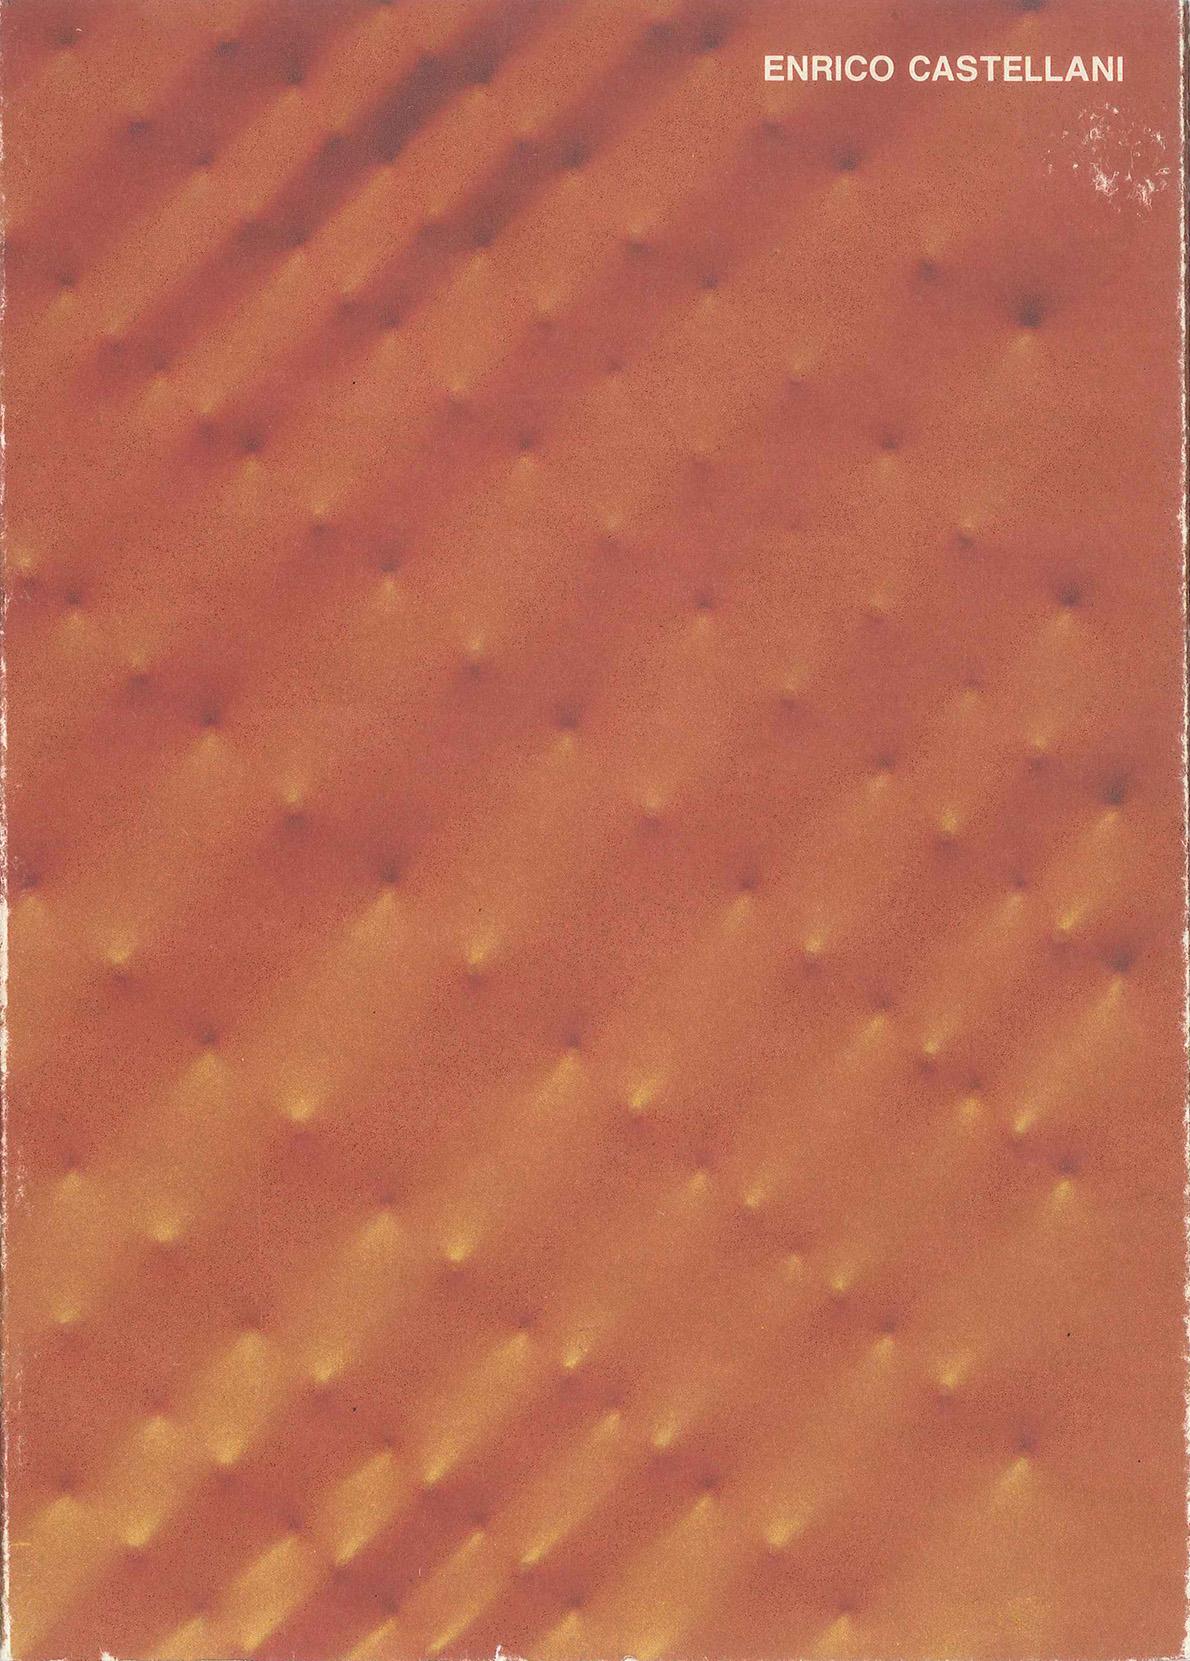 15 - 1989